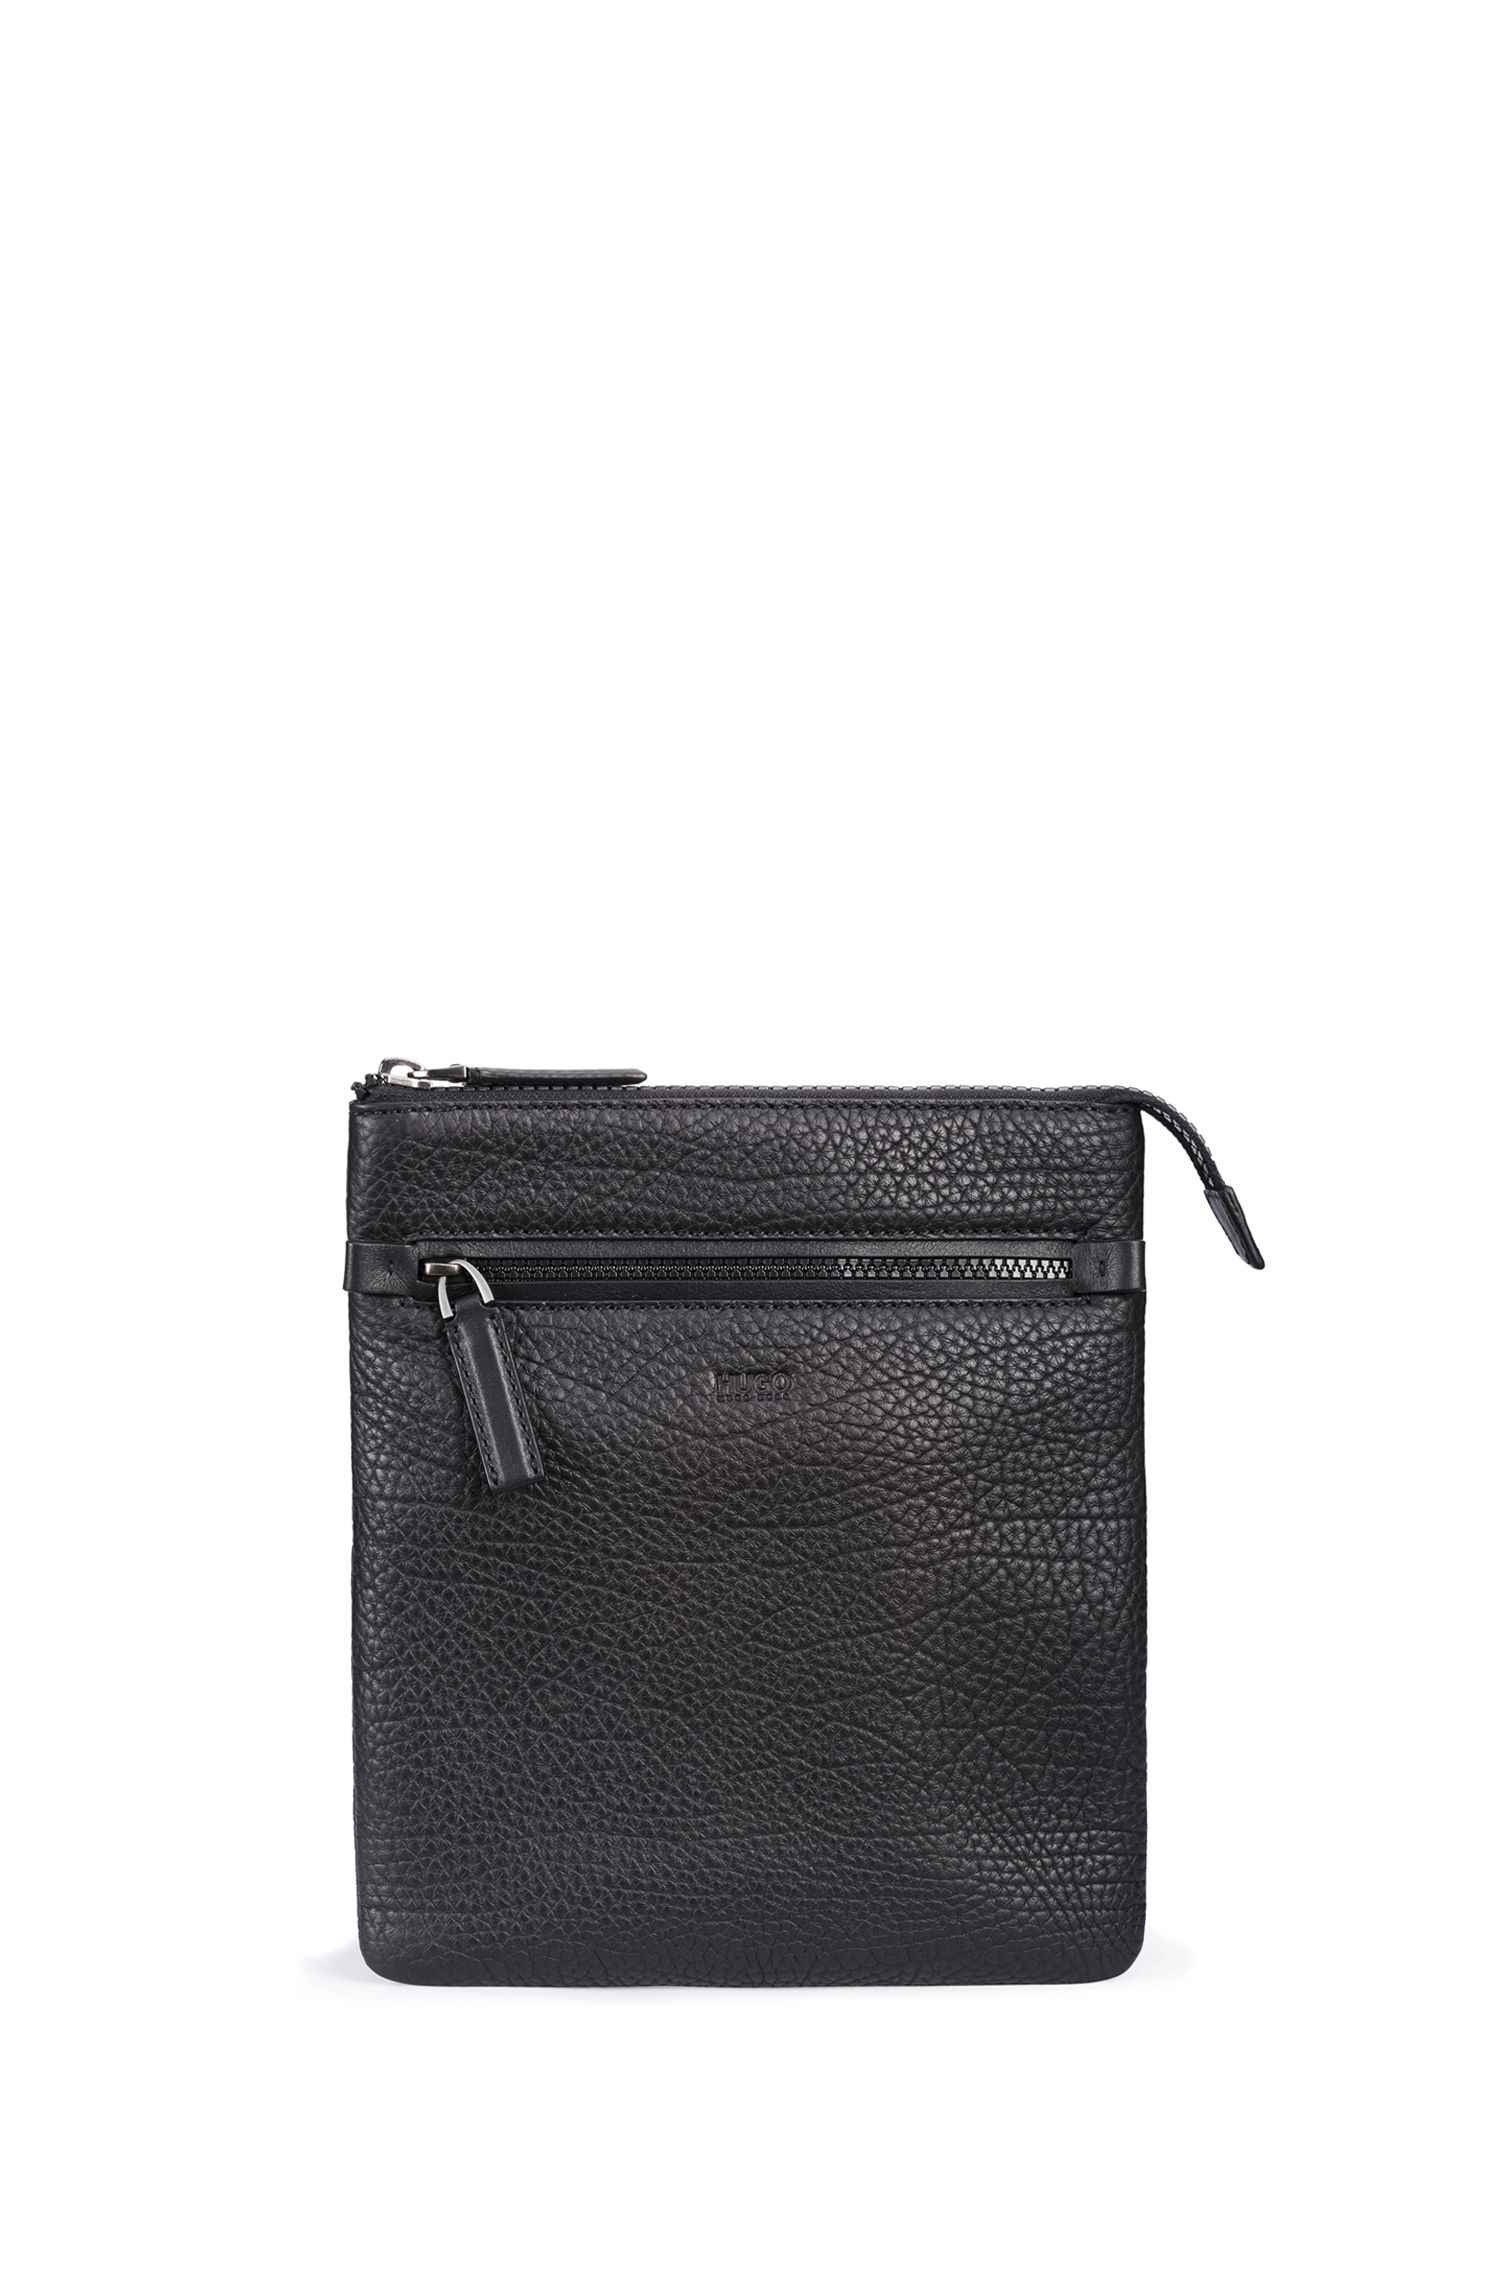 Leather Crossbody Bag | Victorian S Zip Env, Black